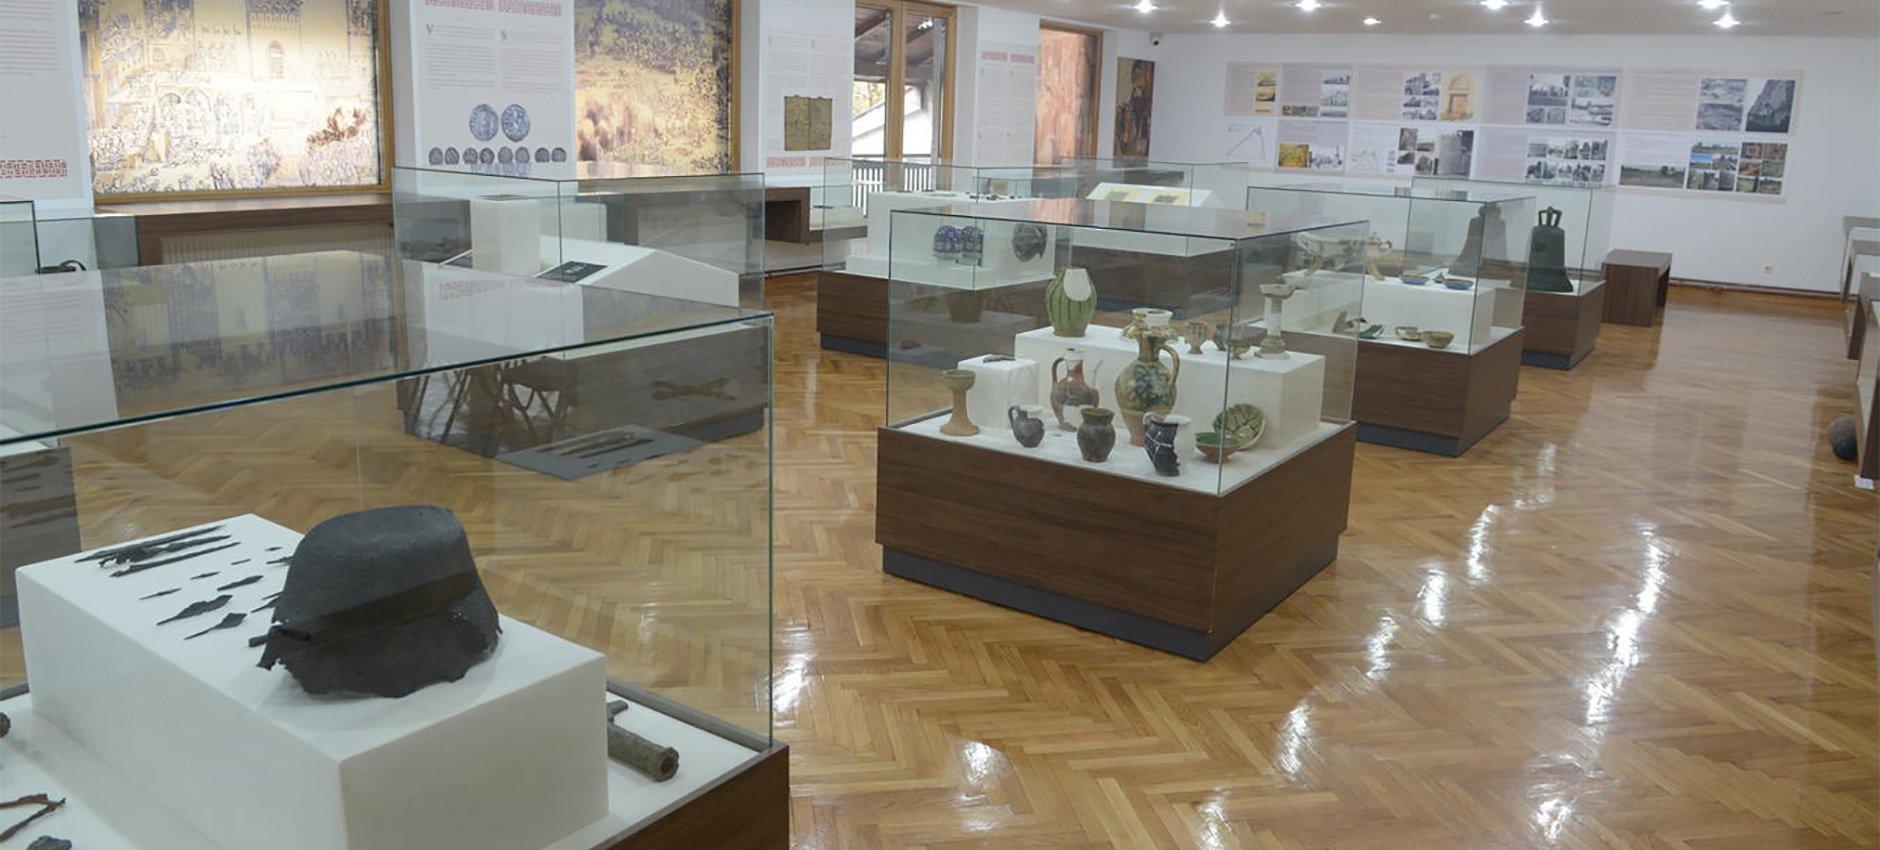 smederevo-muzej-17.jpg